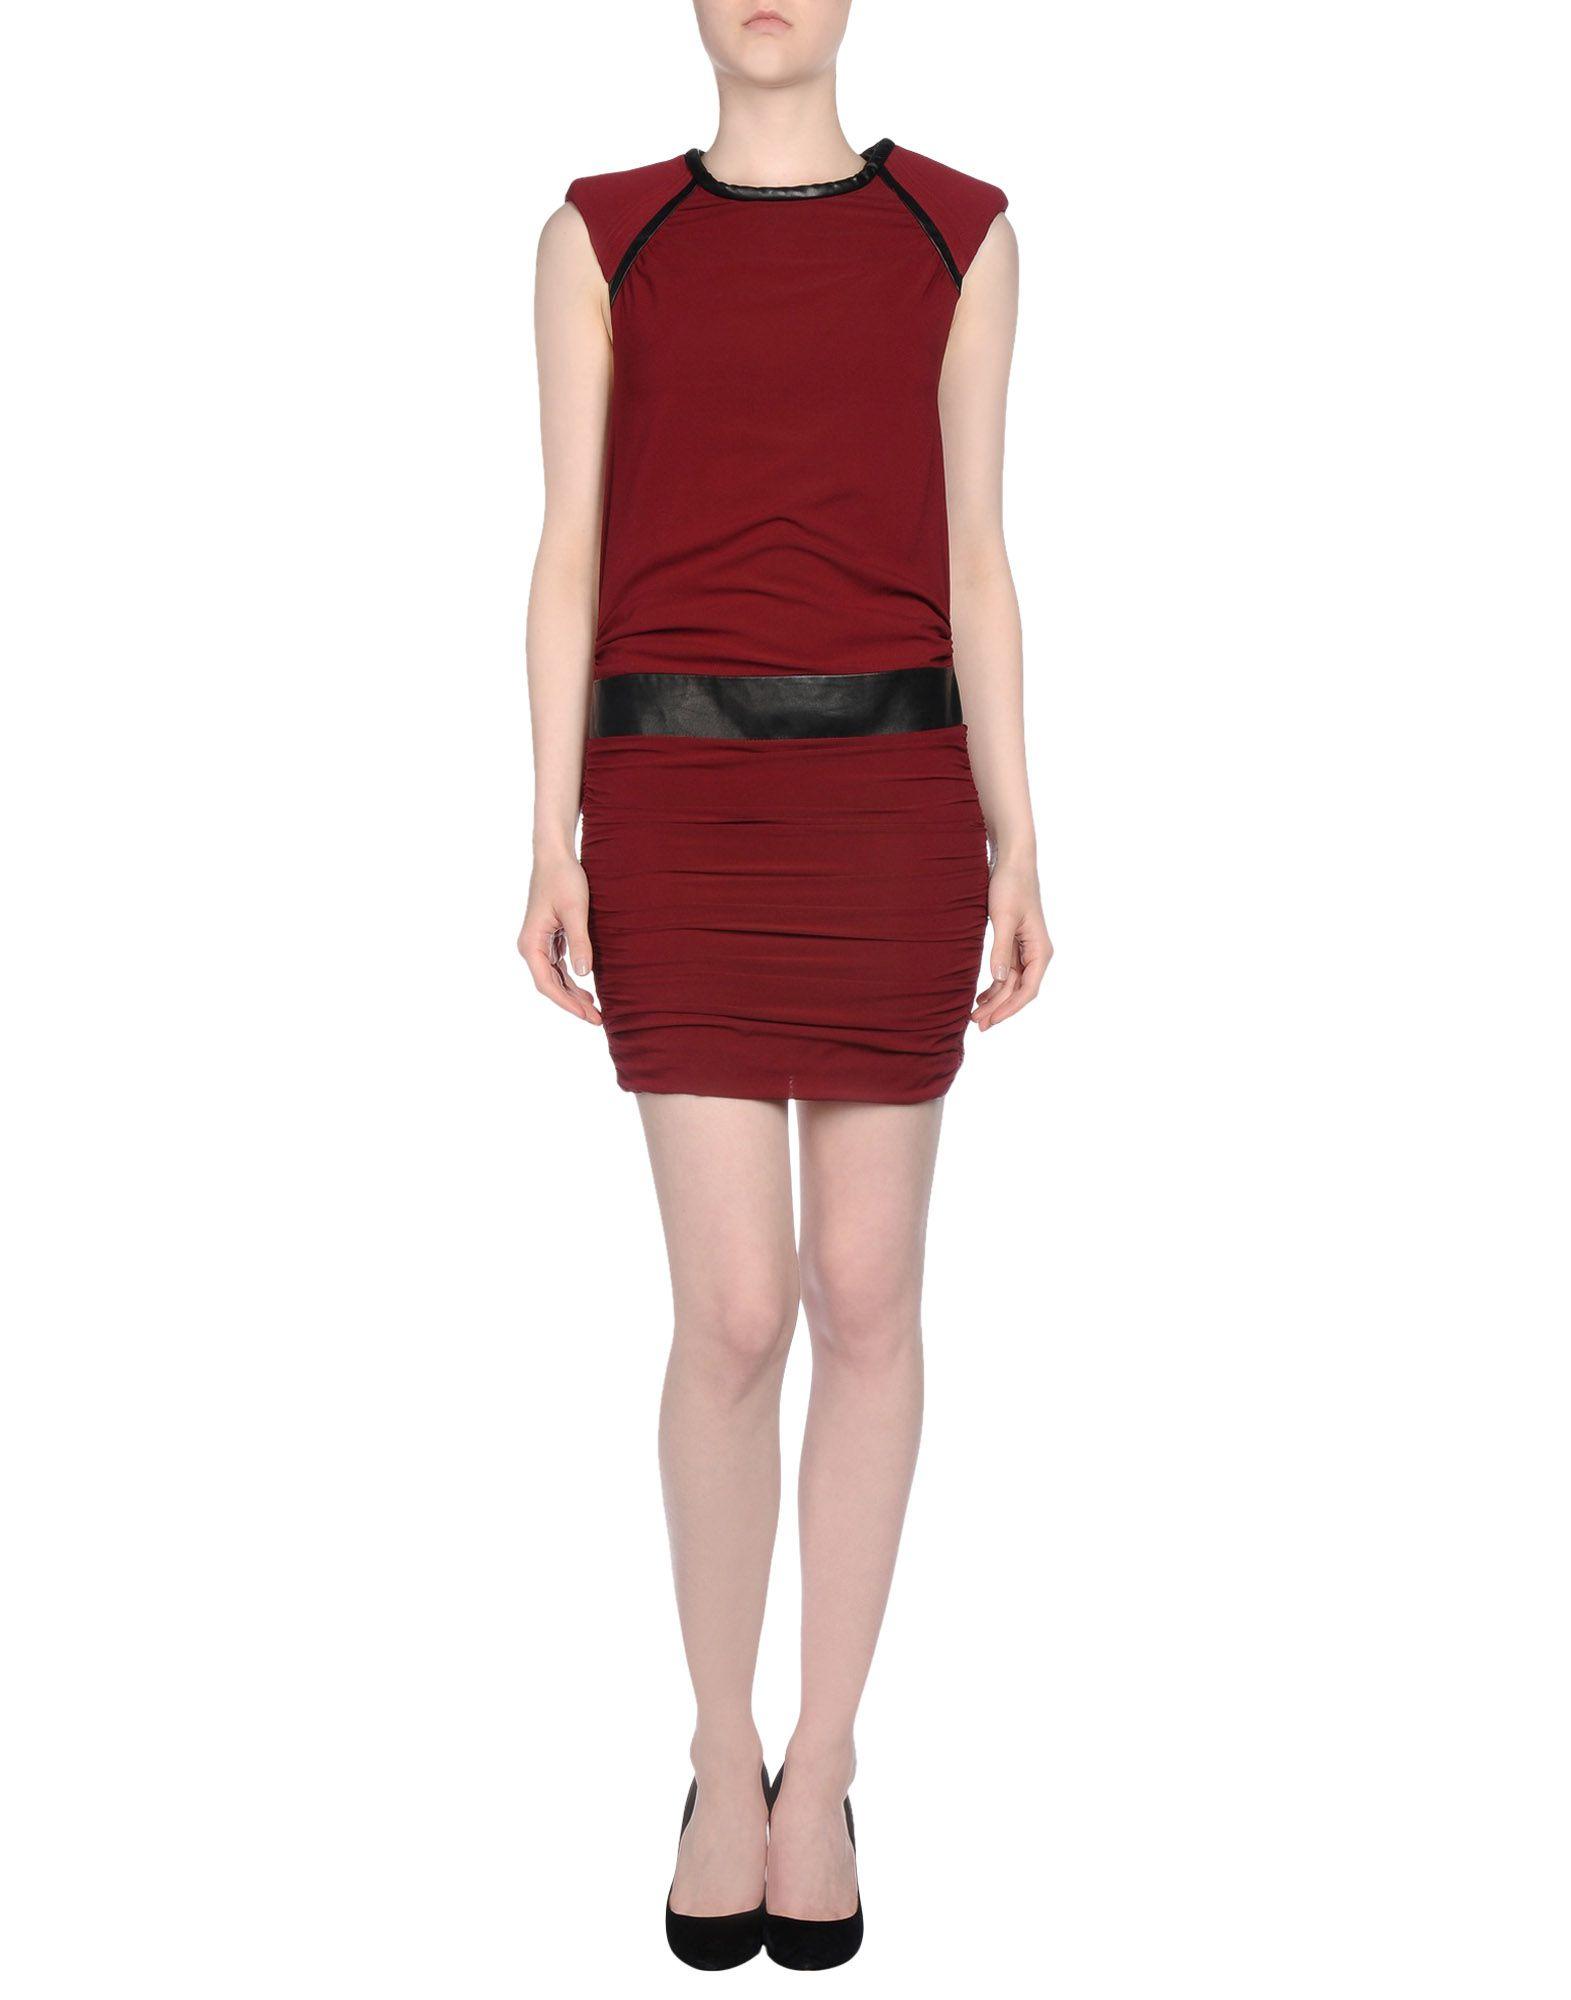 79d8a8ae322 Lyst - IRO Short Dress in Purple